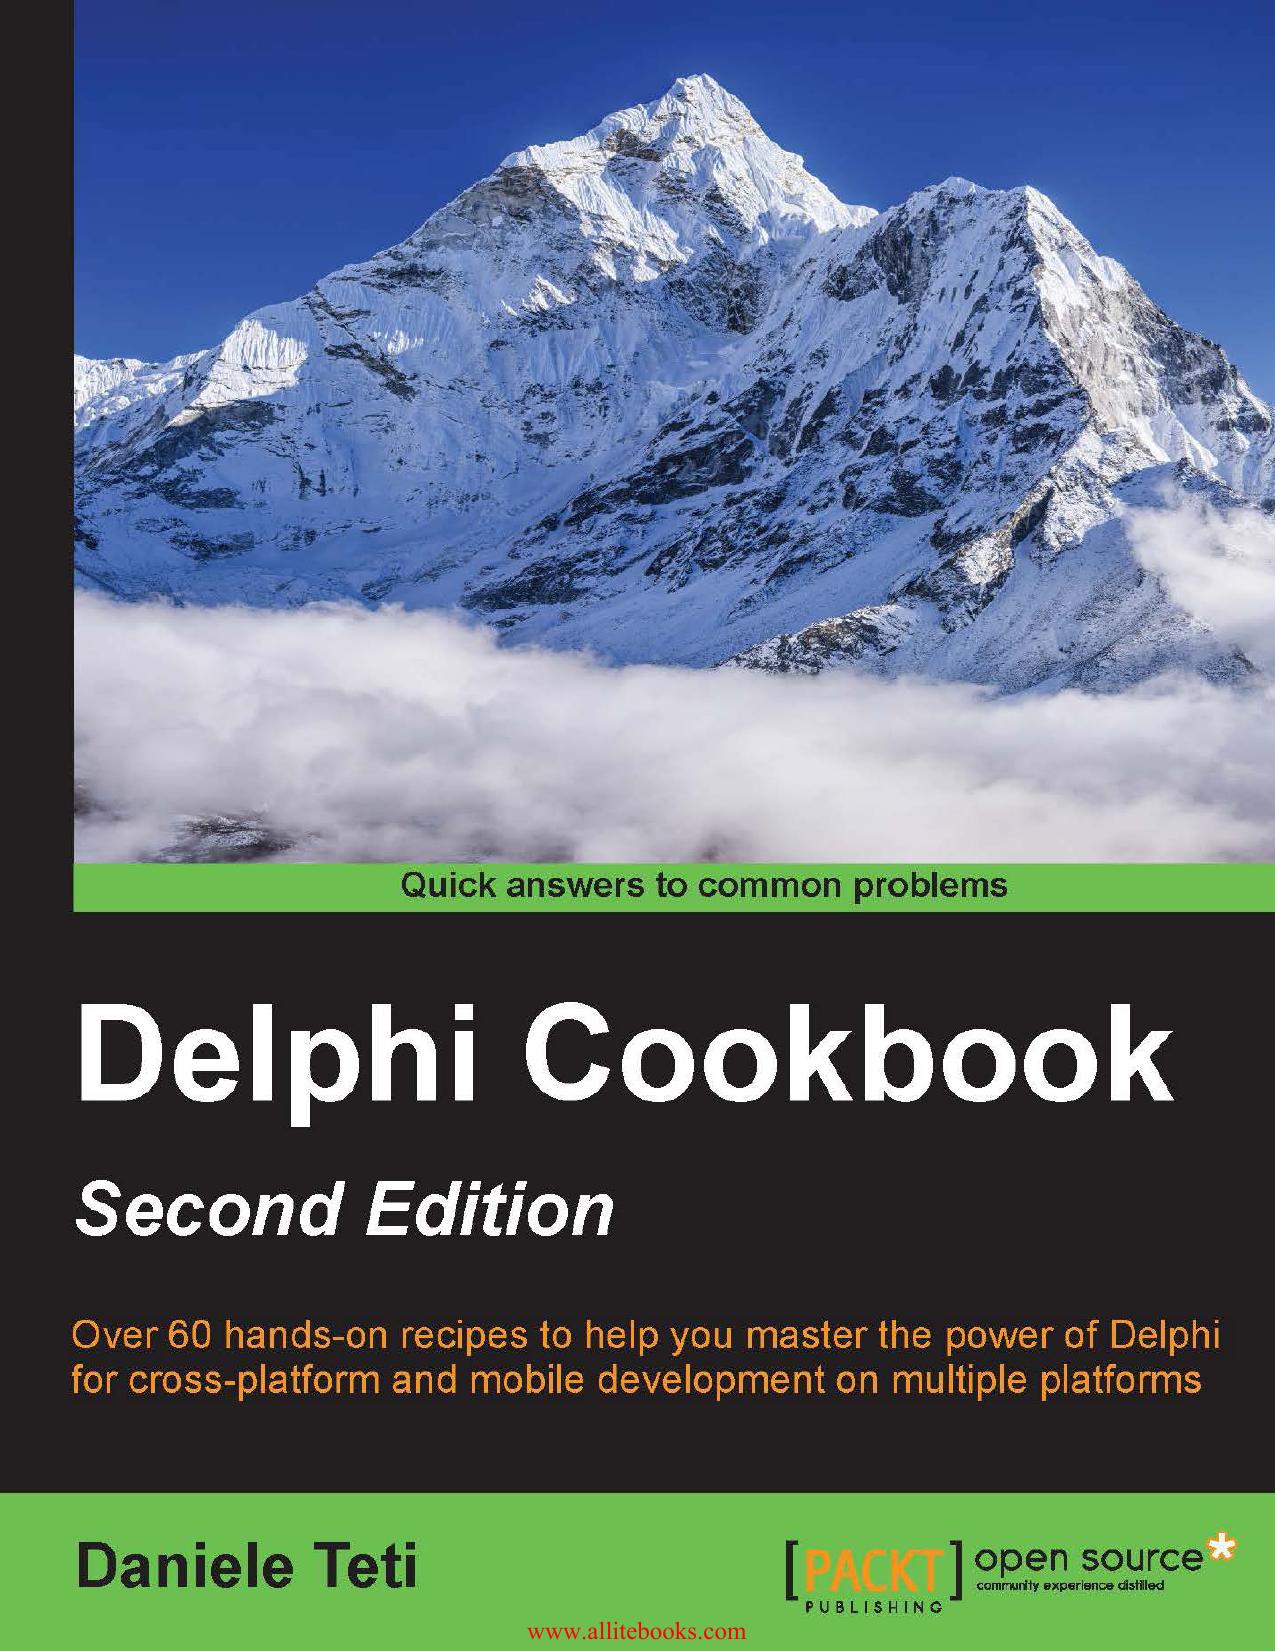 Delphi Cookbook - Second Edition | manualzz com